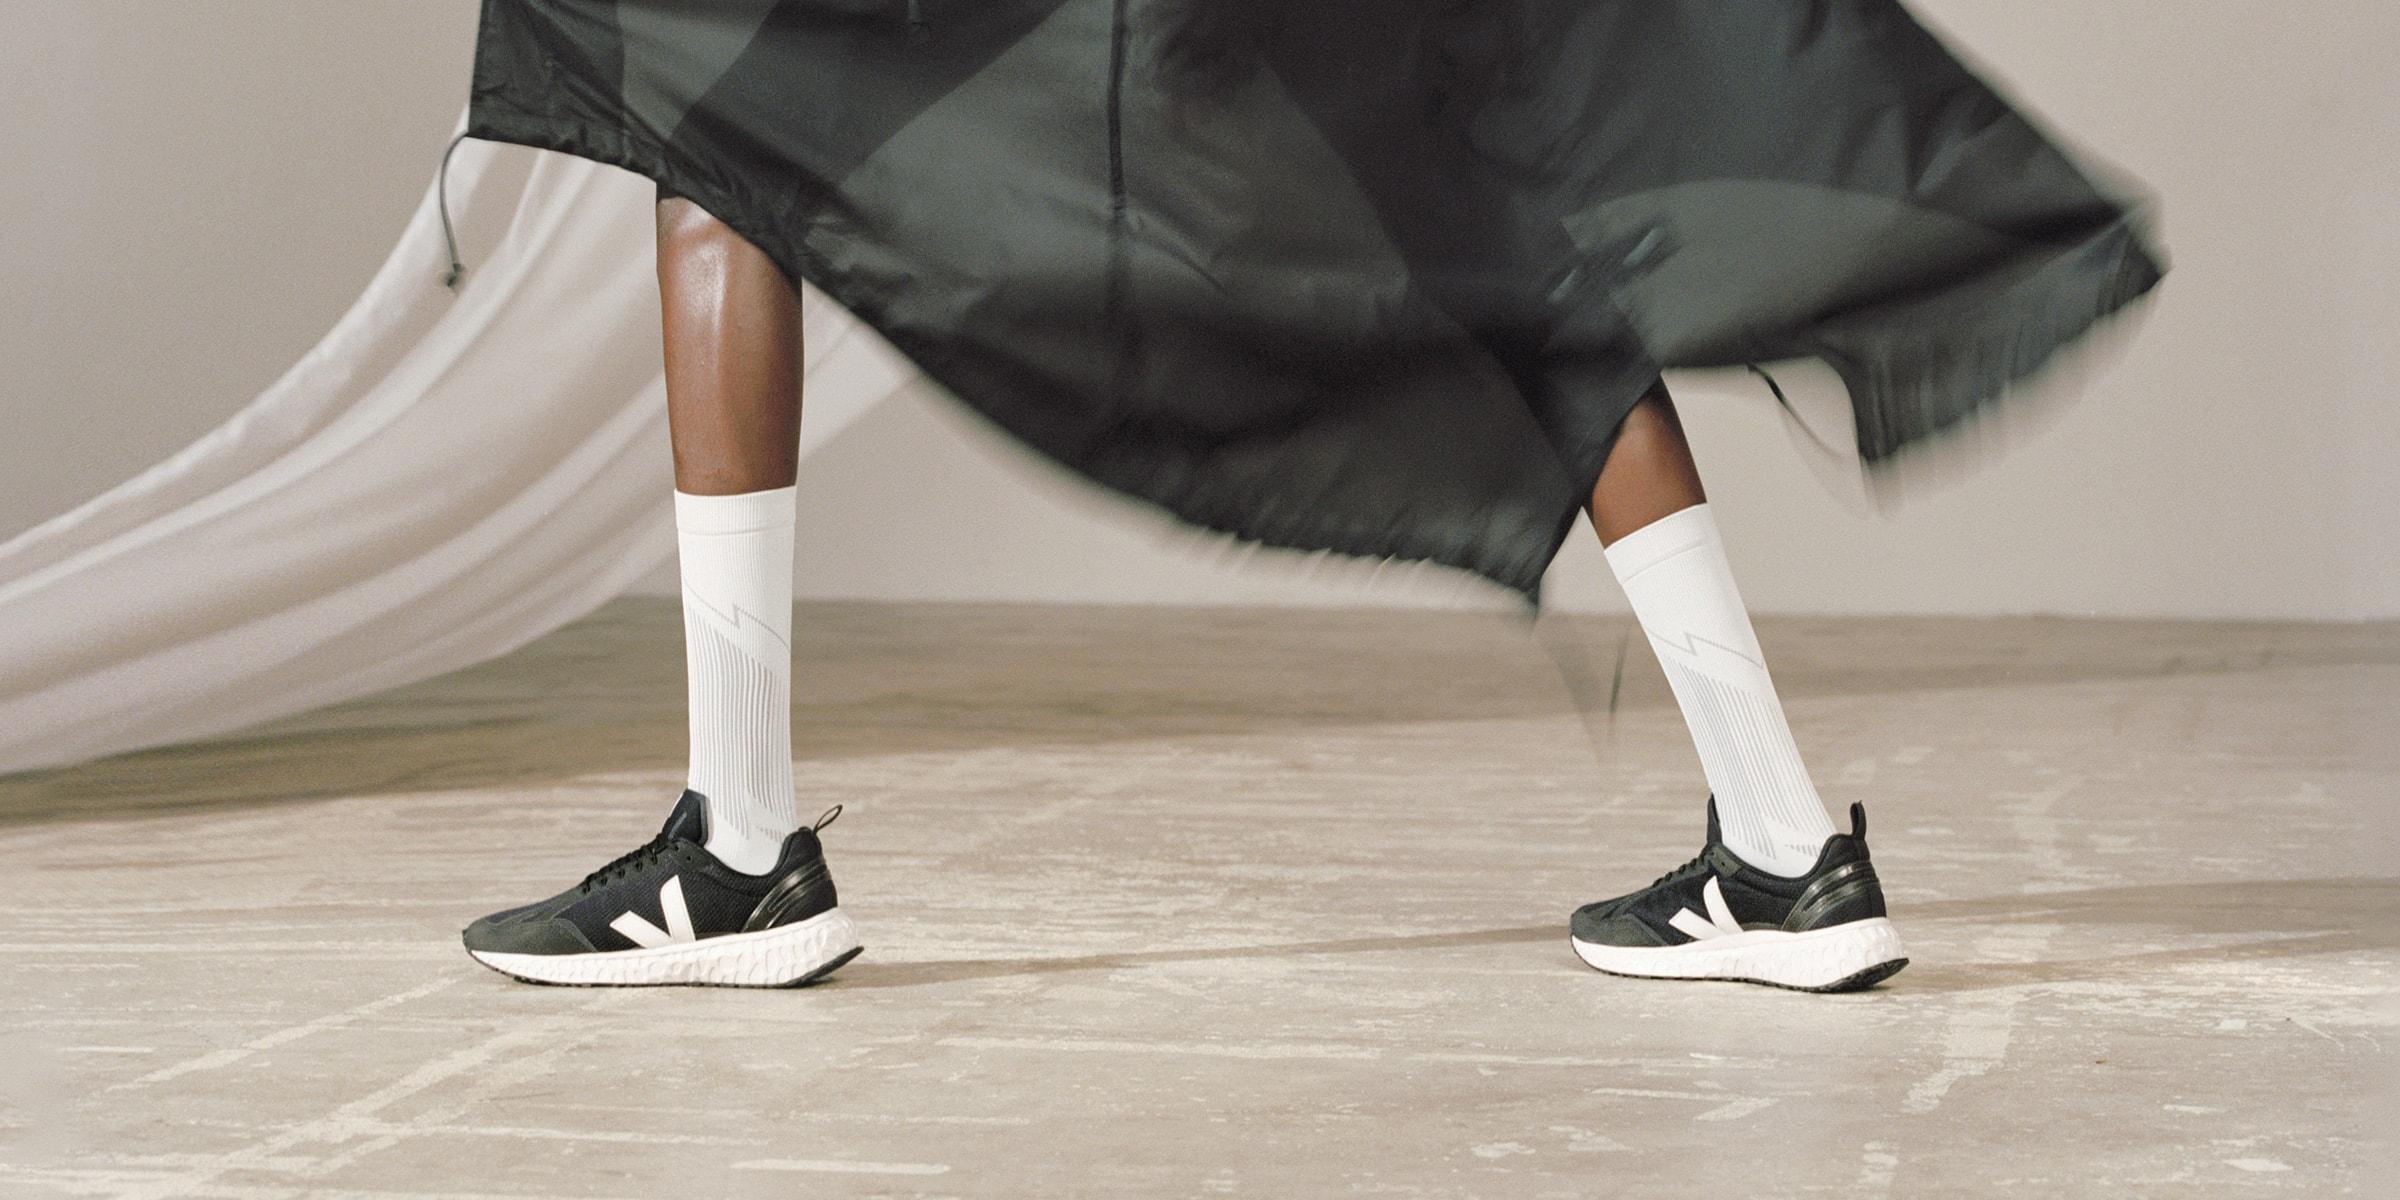 best women workout shoes - Luxe Digital